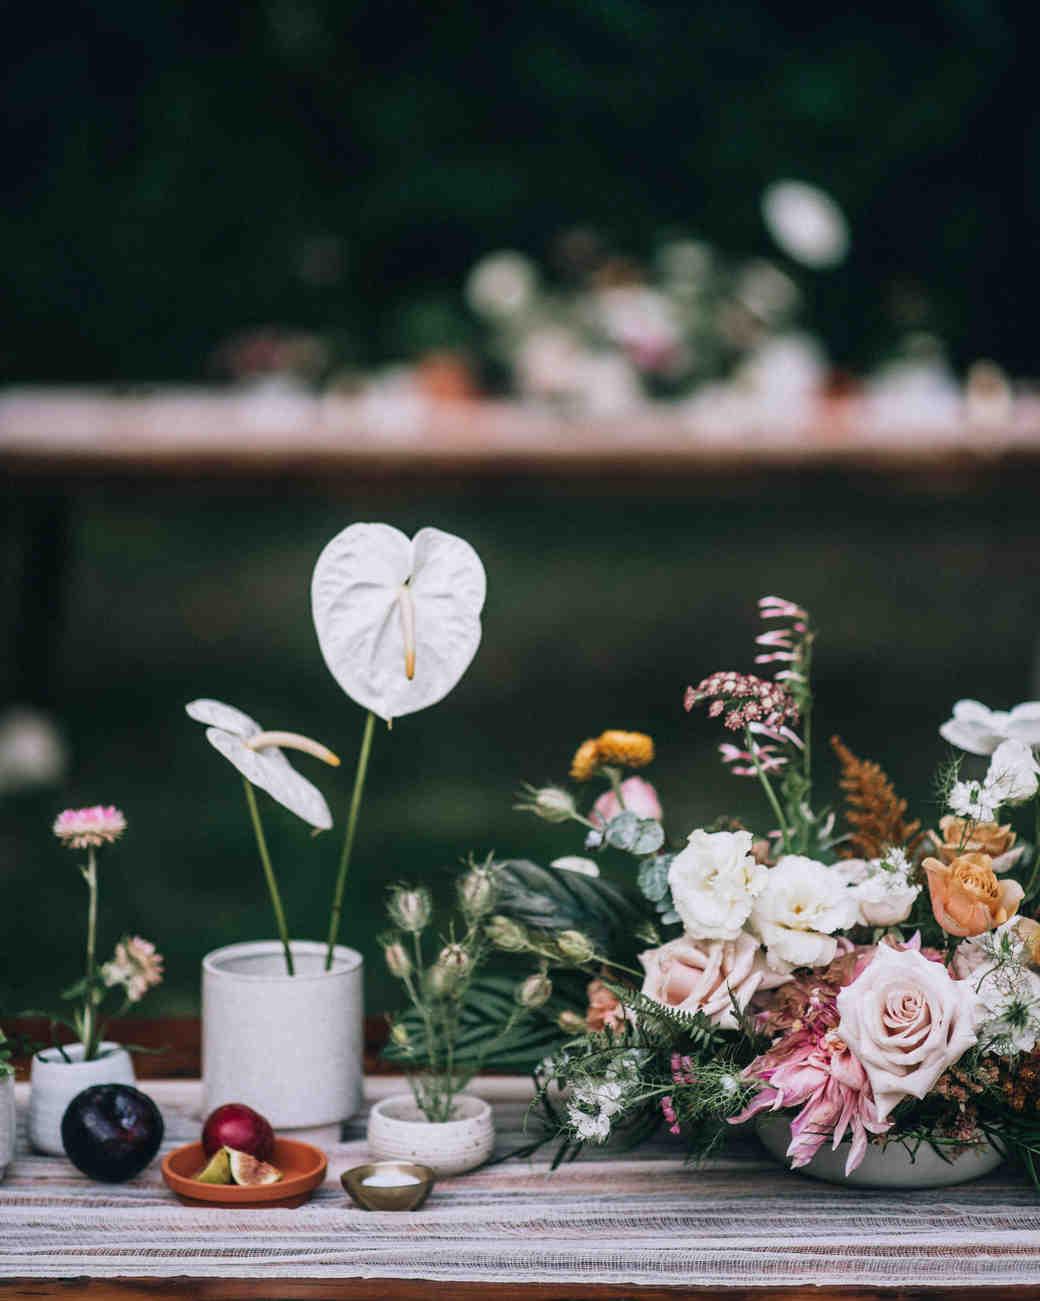 modern wedding centerpiece made of wildflowers